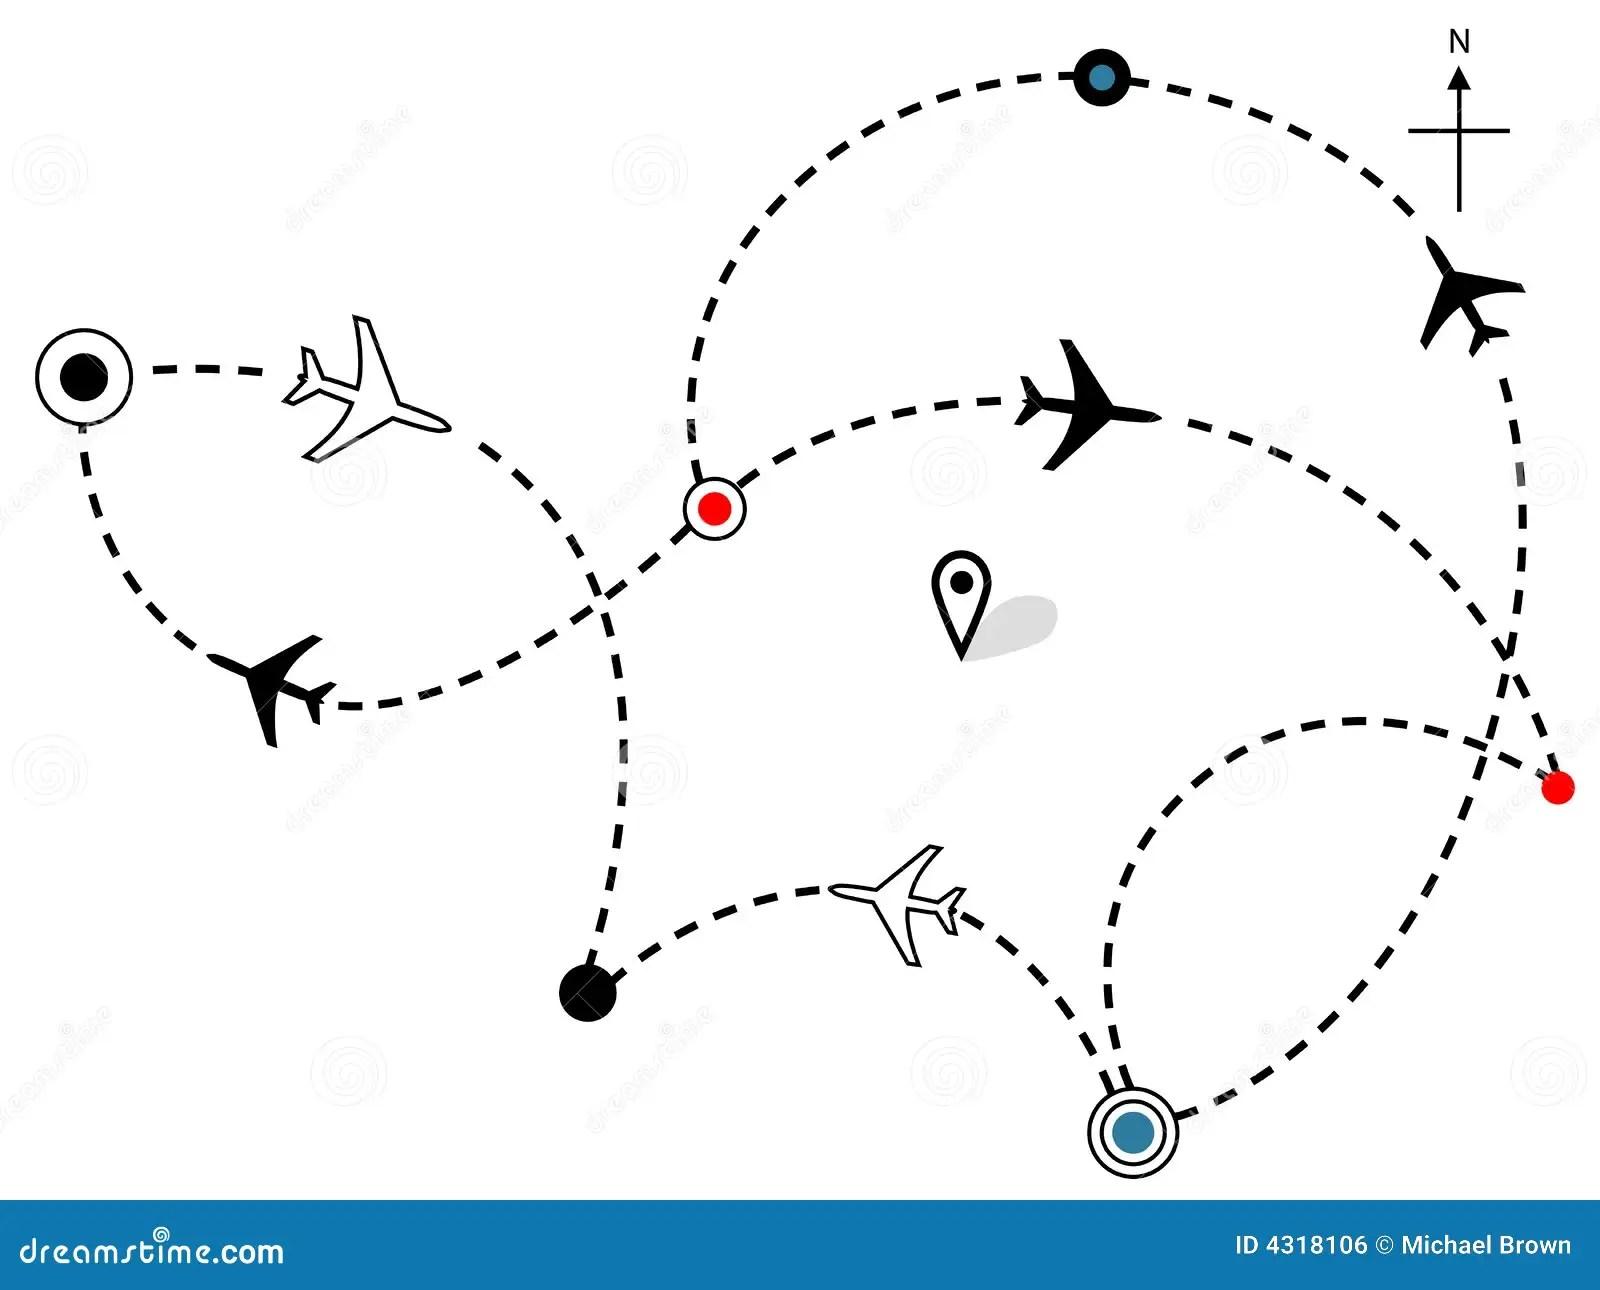 Airline Plane Flight Paths Travel Plans Map Vector